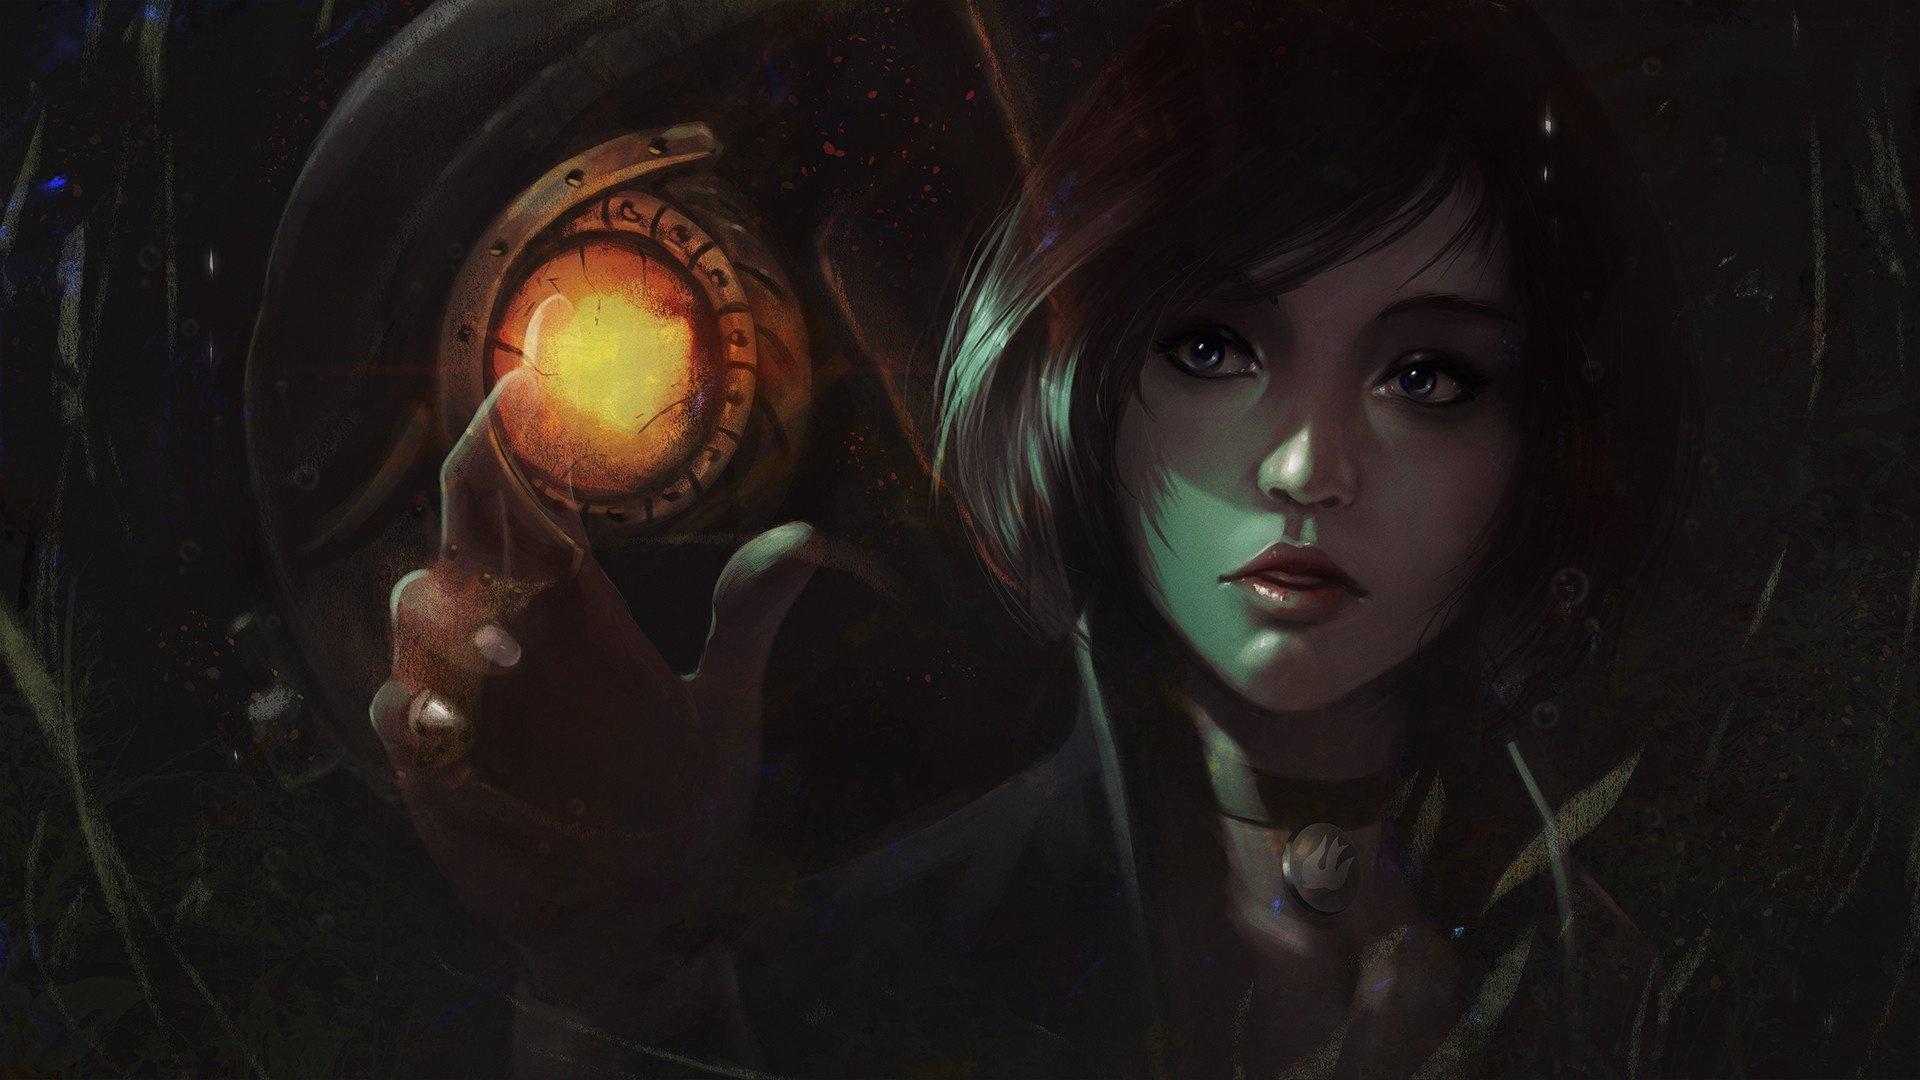 Elizabeth Bioshock Infinite Wallpaper, HD Games 4K ...